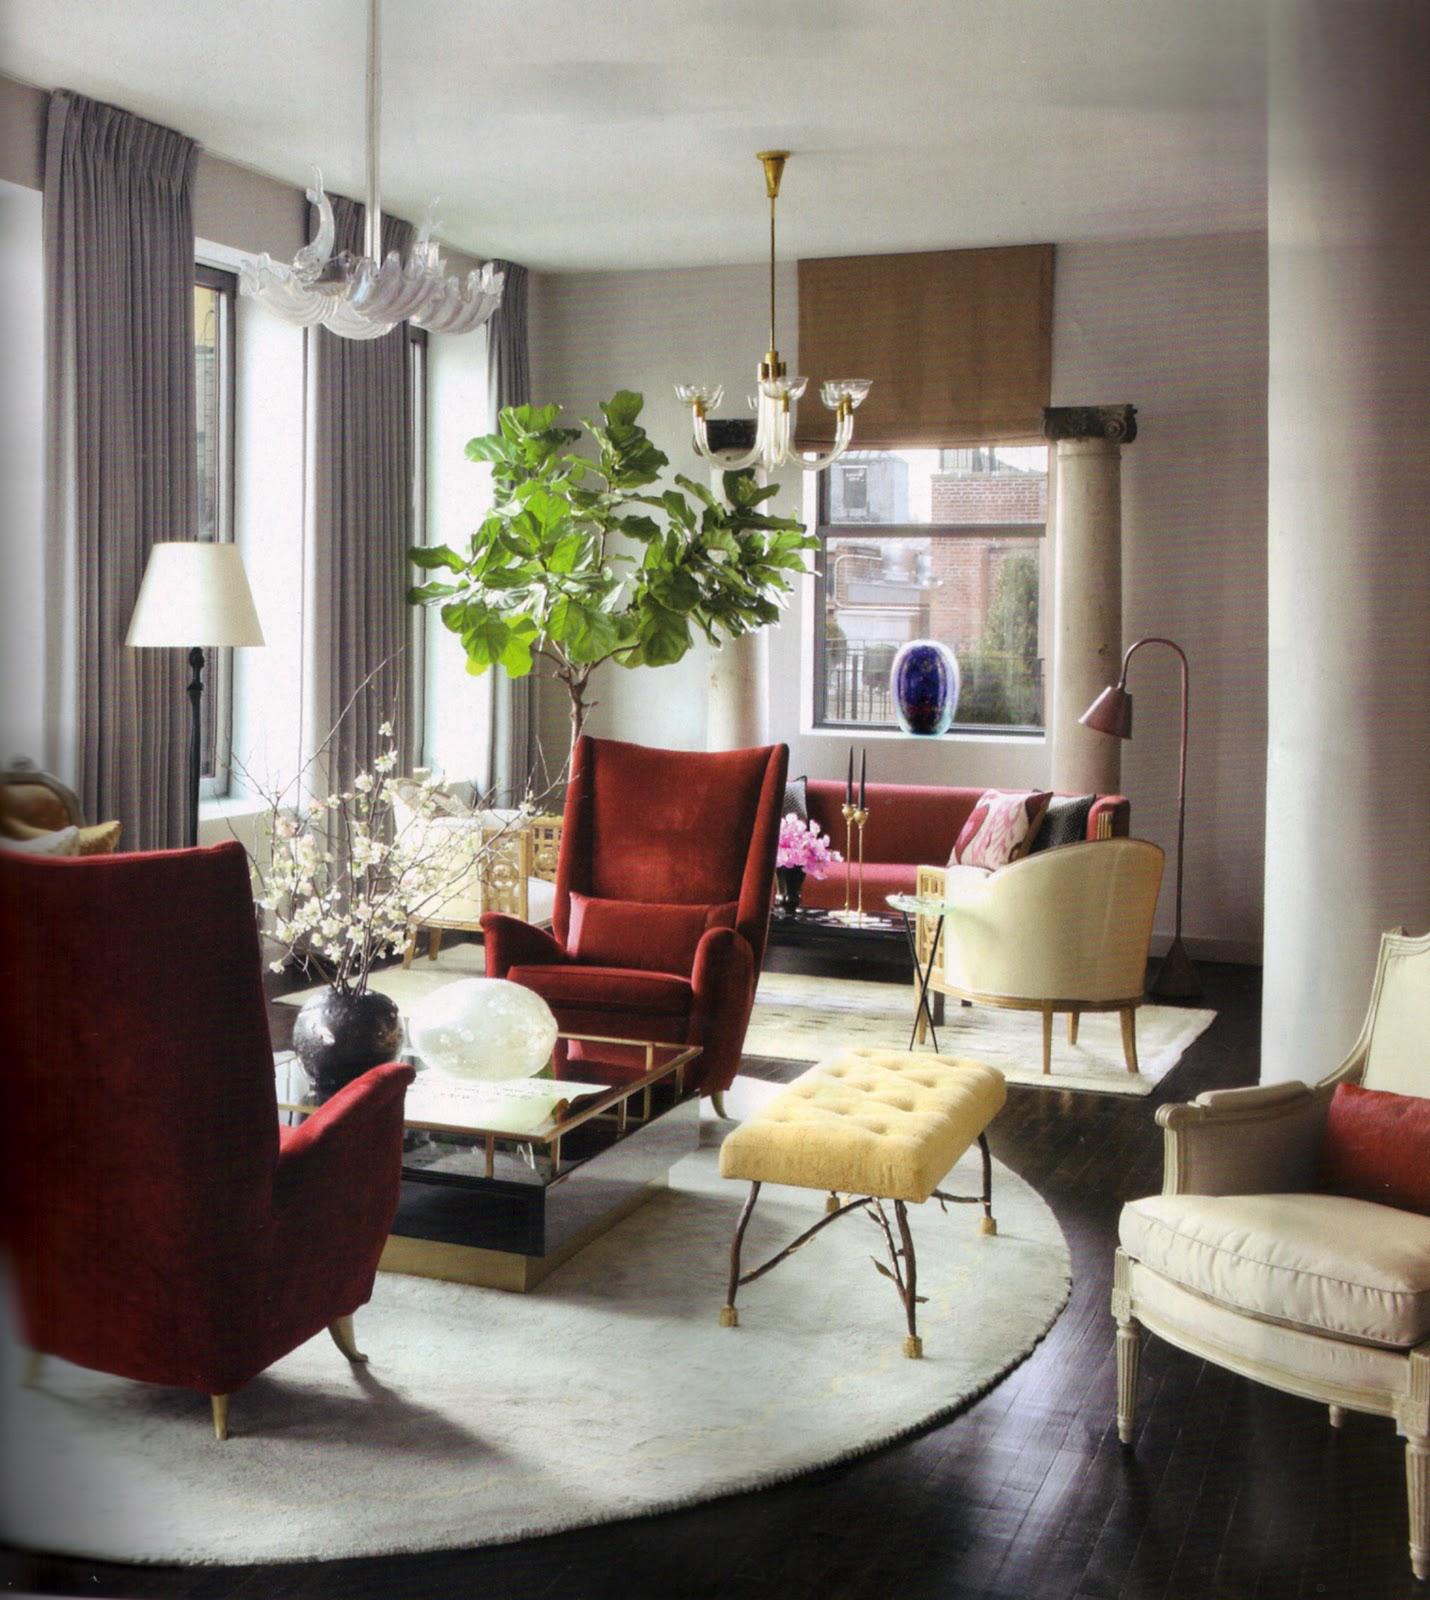 New home interior design splendid sass - New home interior design ...